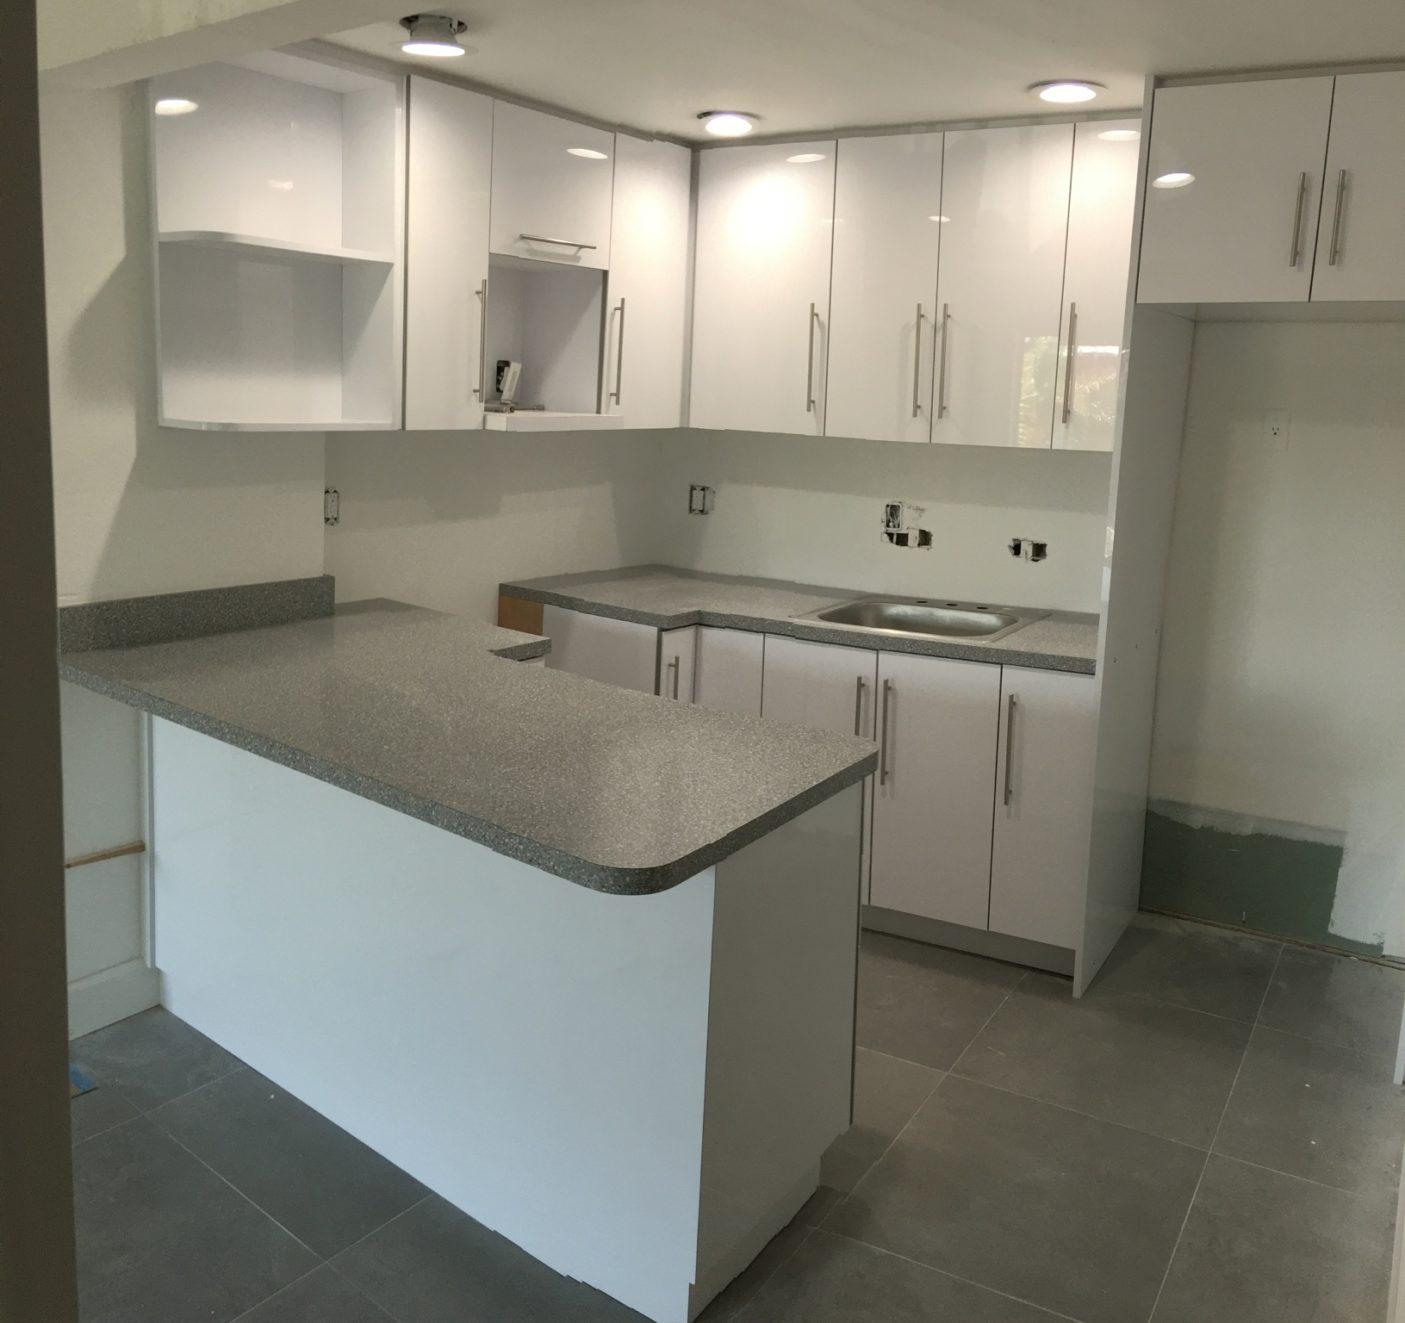 Kitchens-102.jpg